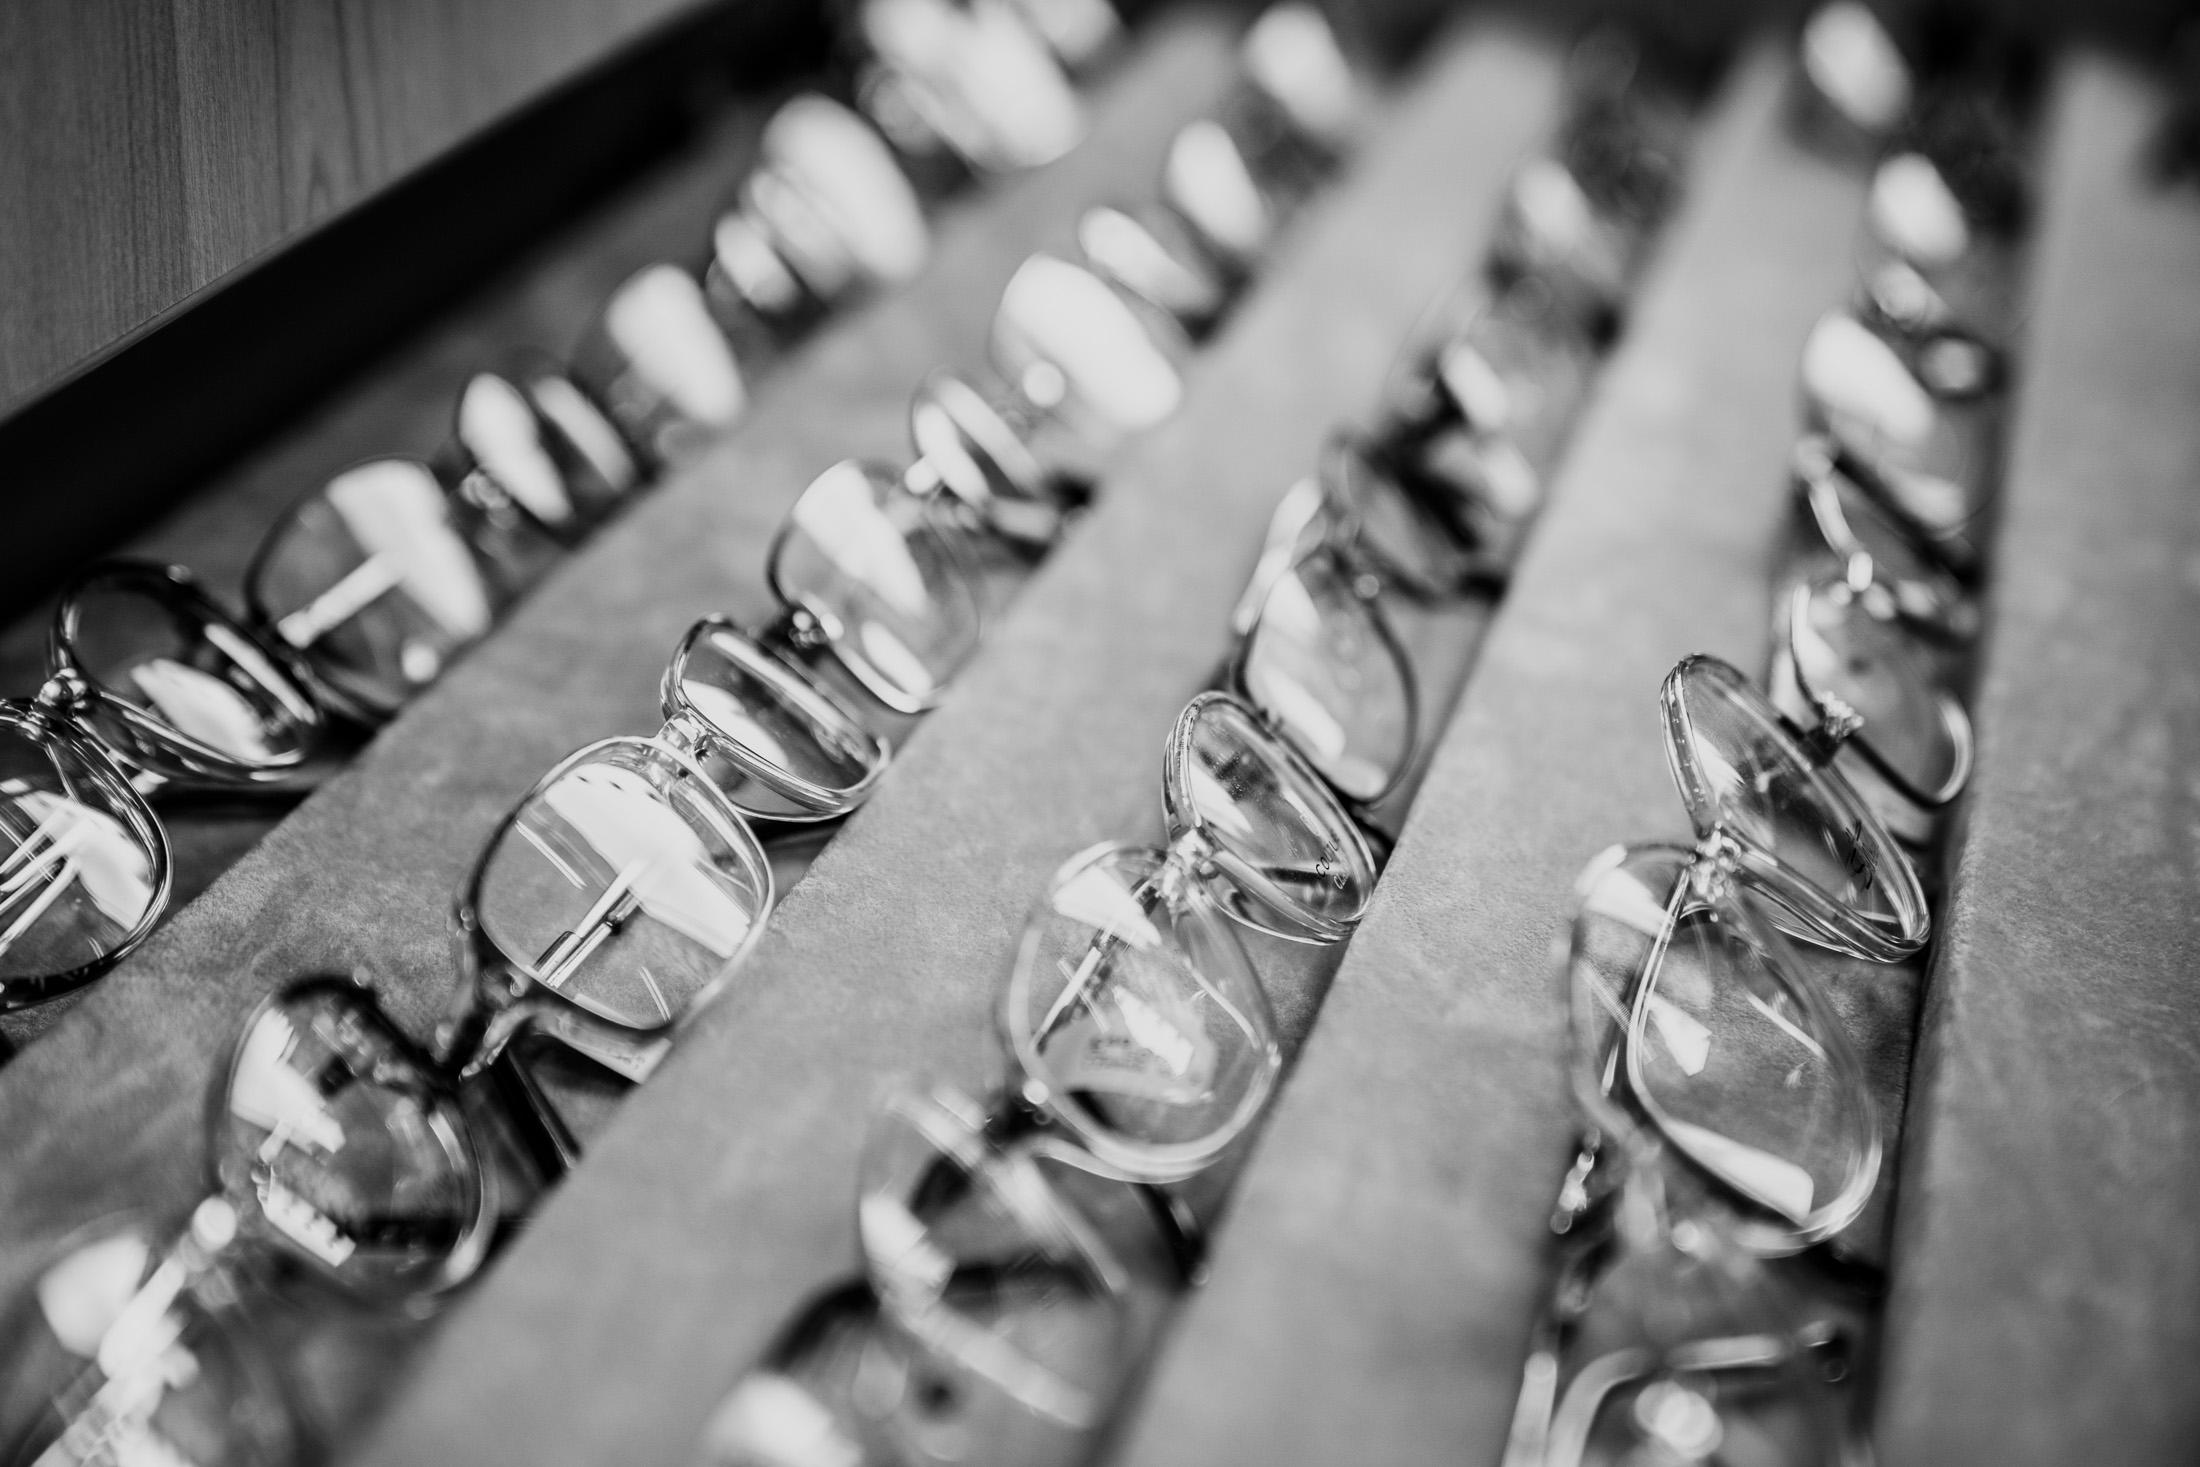 Commercial_photography_optometrist_glasses_drawer.jpg